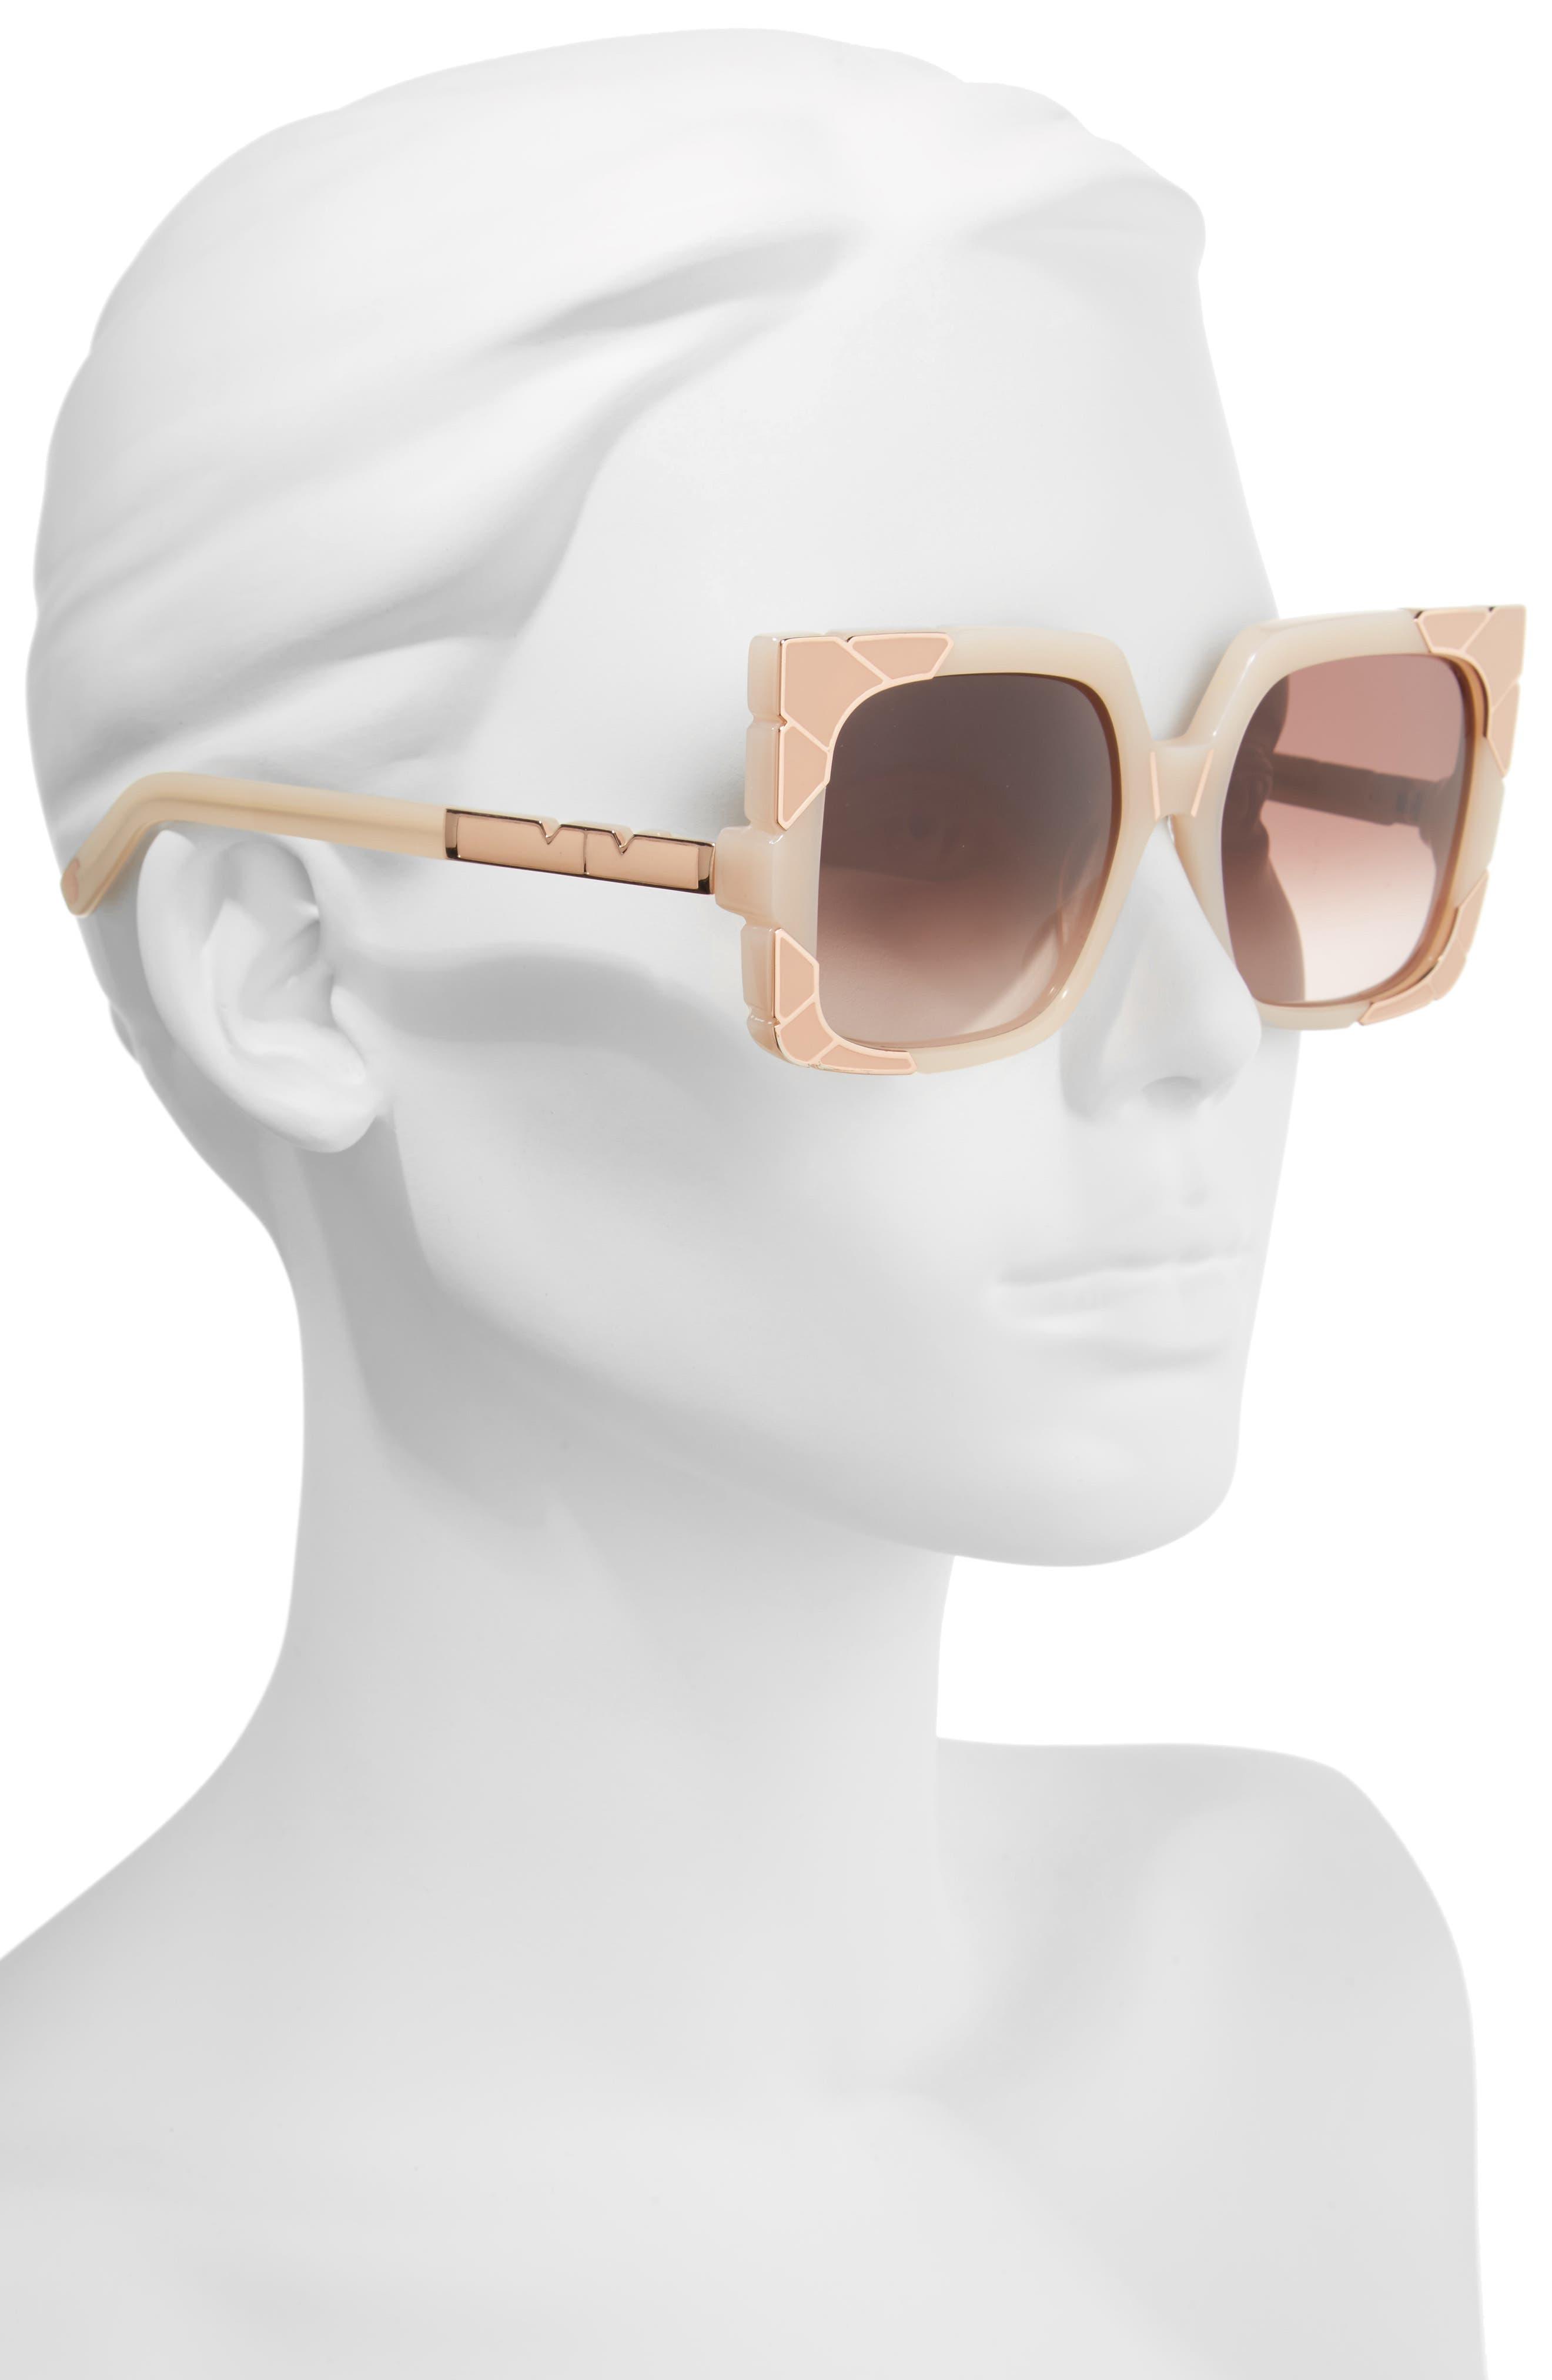 Sun & Shade 55mm Square Retro Sunglasses,                             Alternate thumbnail 2, color,                             BLUSH/ ROSE GOLD/ BROWN